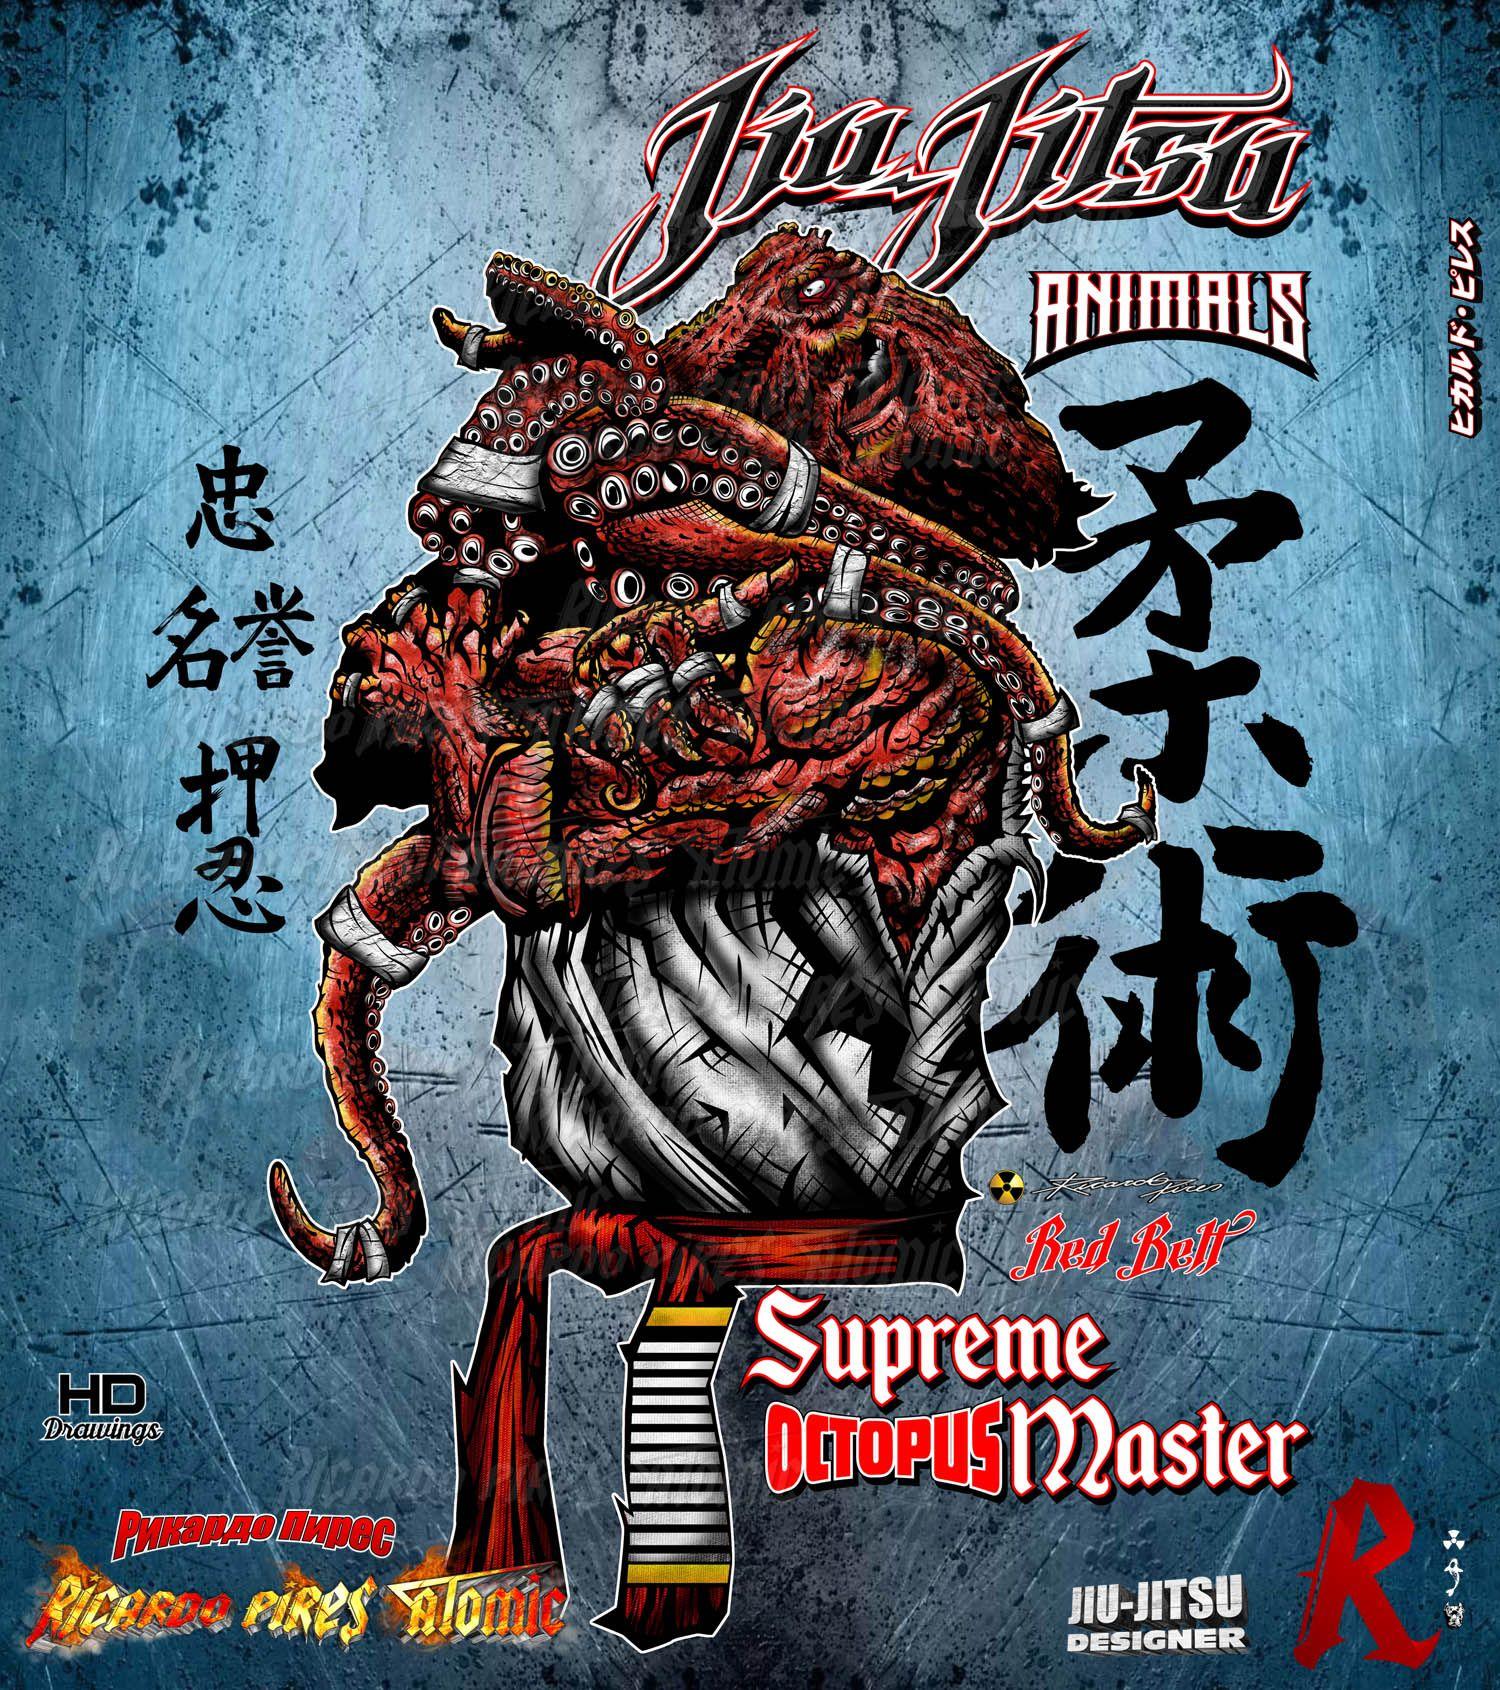 Jiu-Jitsu Octopus Supreme Master Red Belt Drawings for Sale